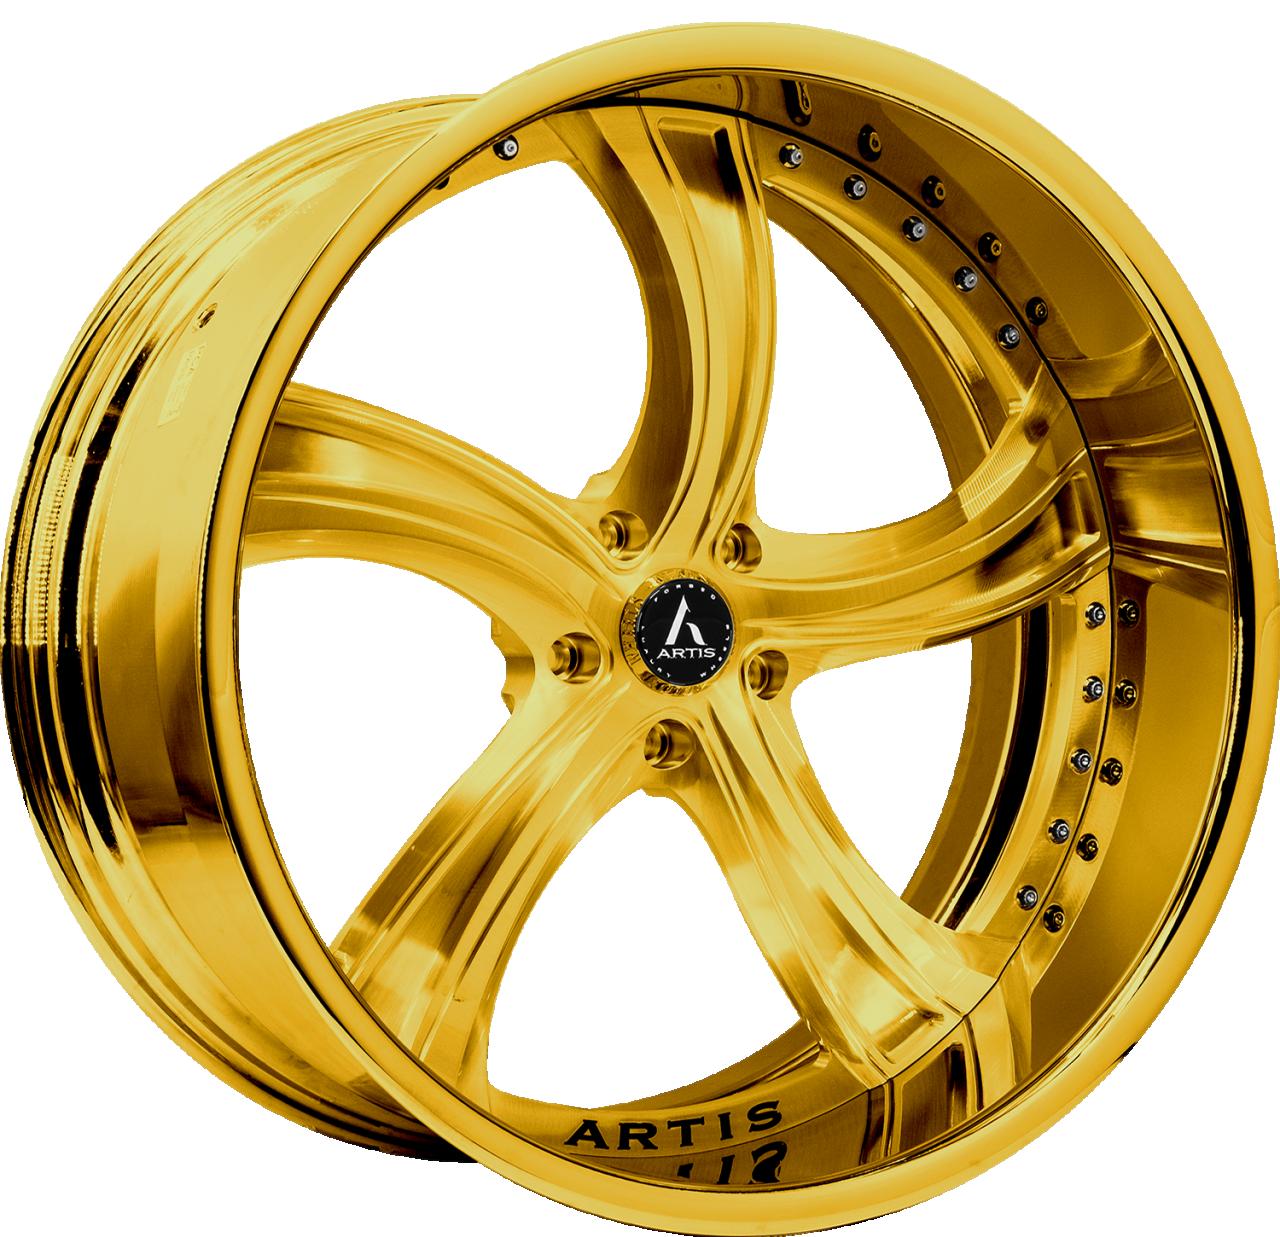 Artis Forged Kokomo wheel with Custom Gold finish